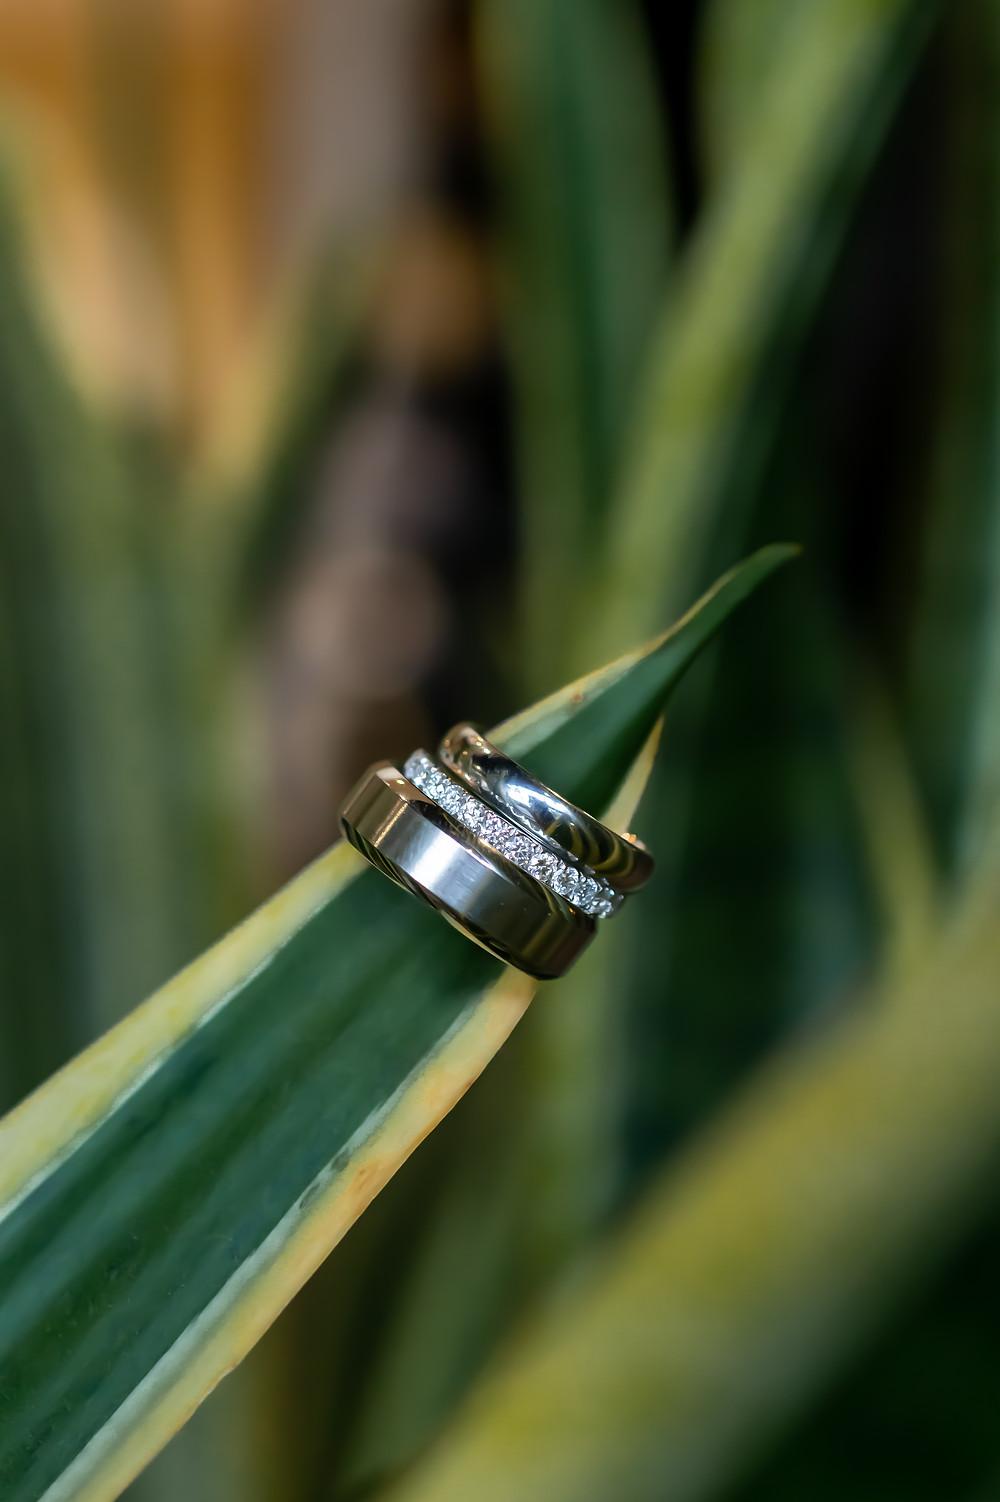 Wedding ring shot on Hilton Head Island in South Carolina.